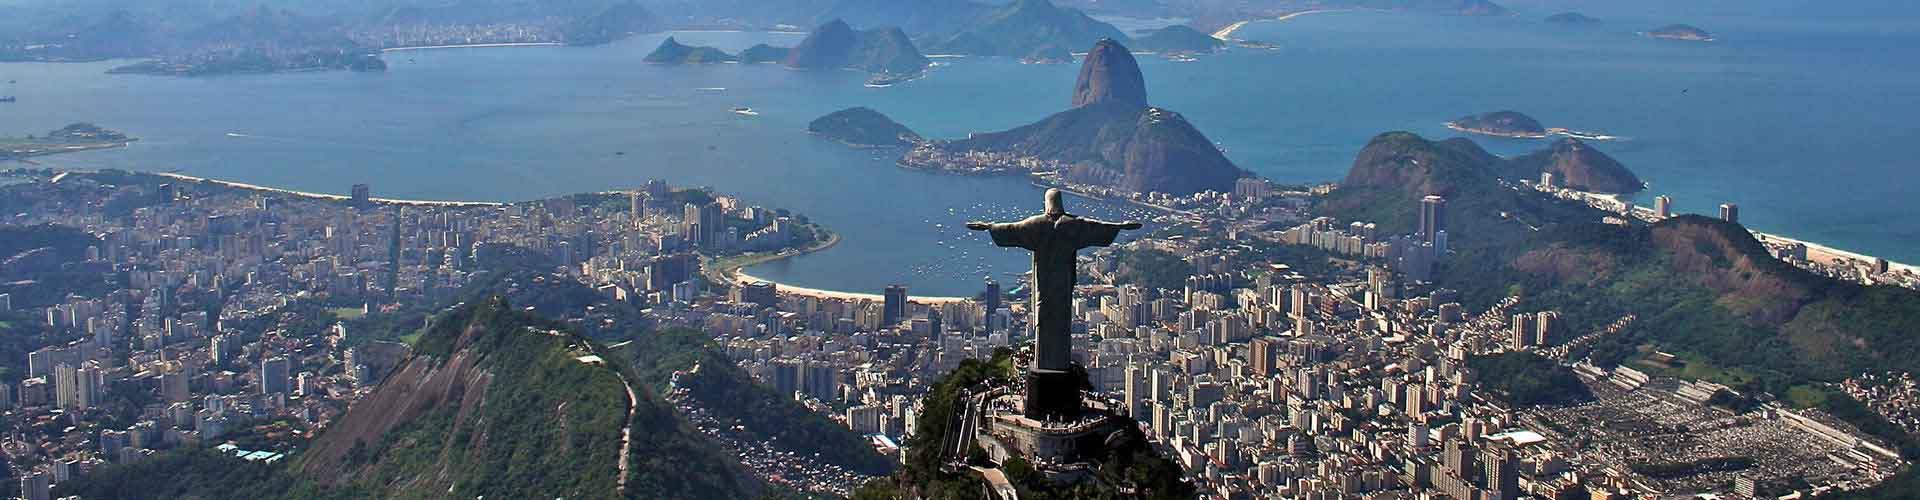 Río de Janeiro - Hostales cerca a Central do Brasil. Mapas de Río de Janeiro, Fotos y comentarios de cada Hostal en Río de Janeiro.